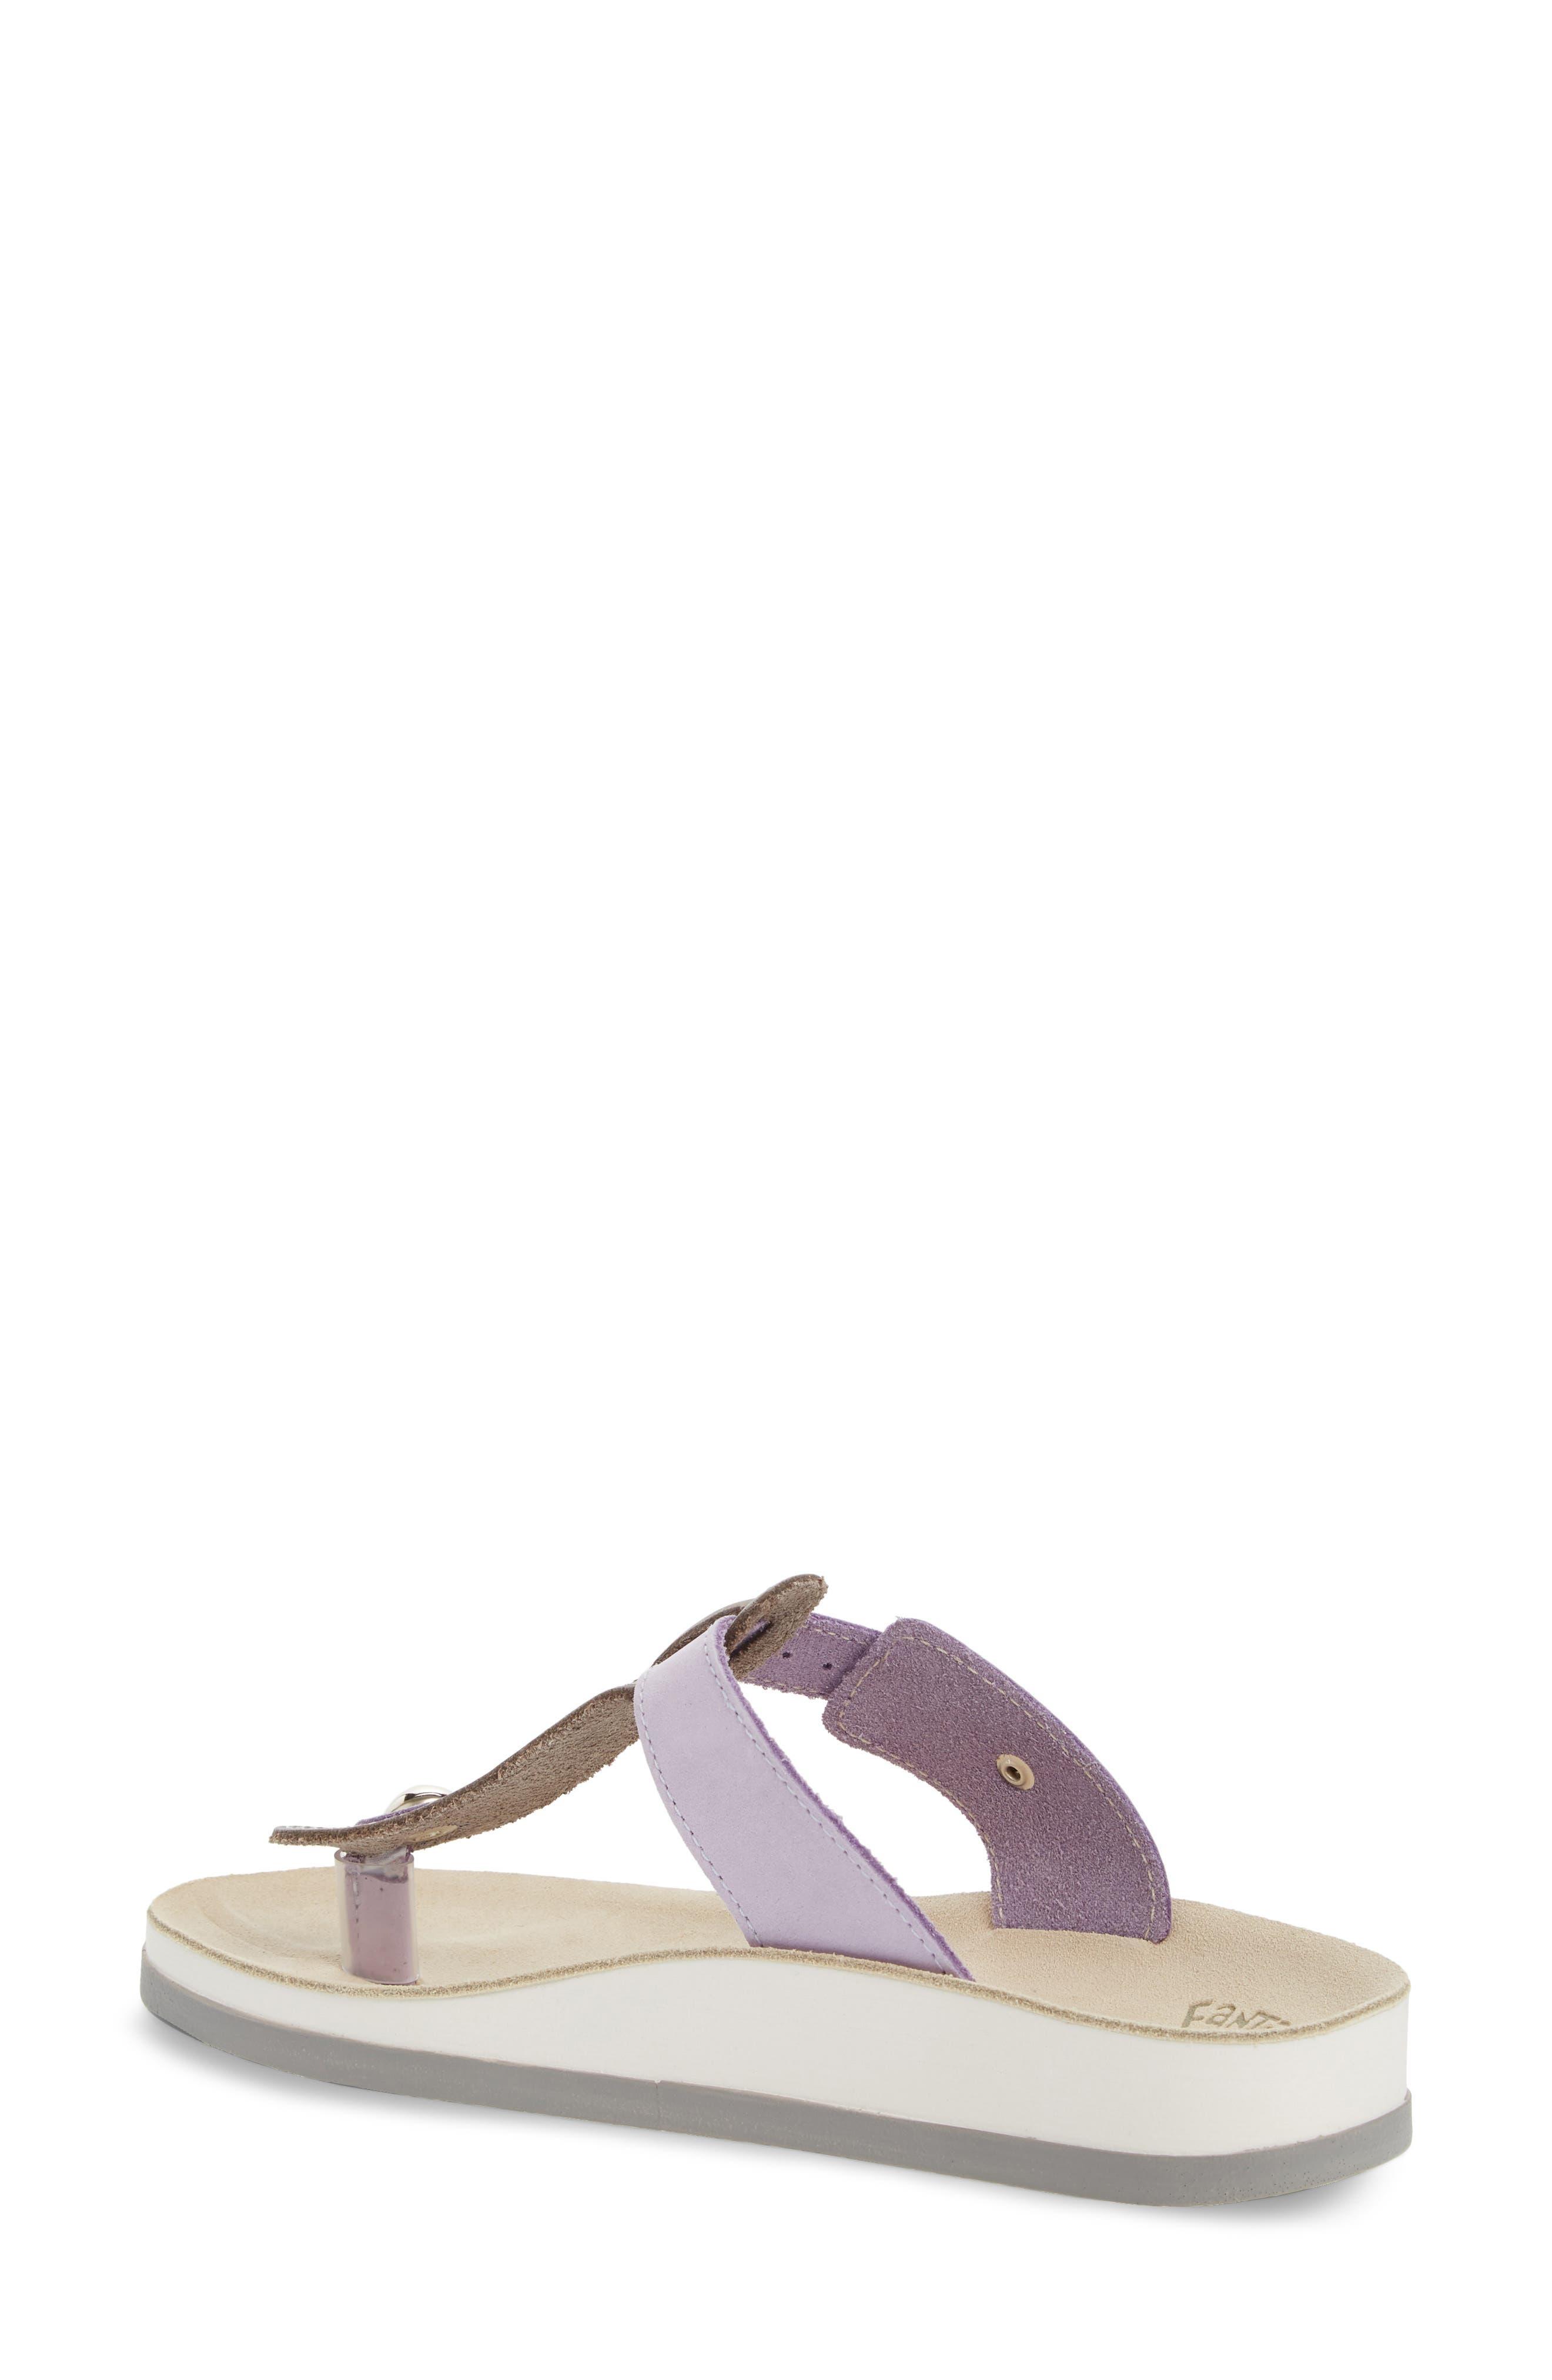 Viola Sandal,                             Alternate thumbnail 2, color,                             020